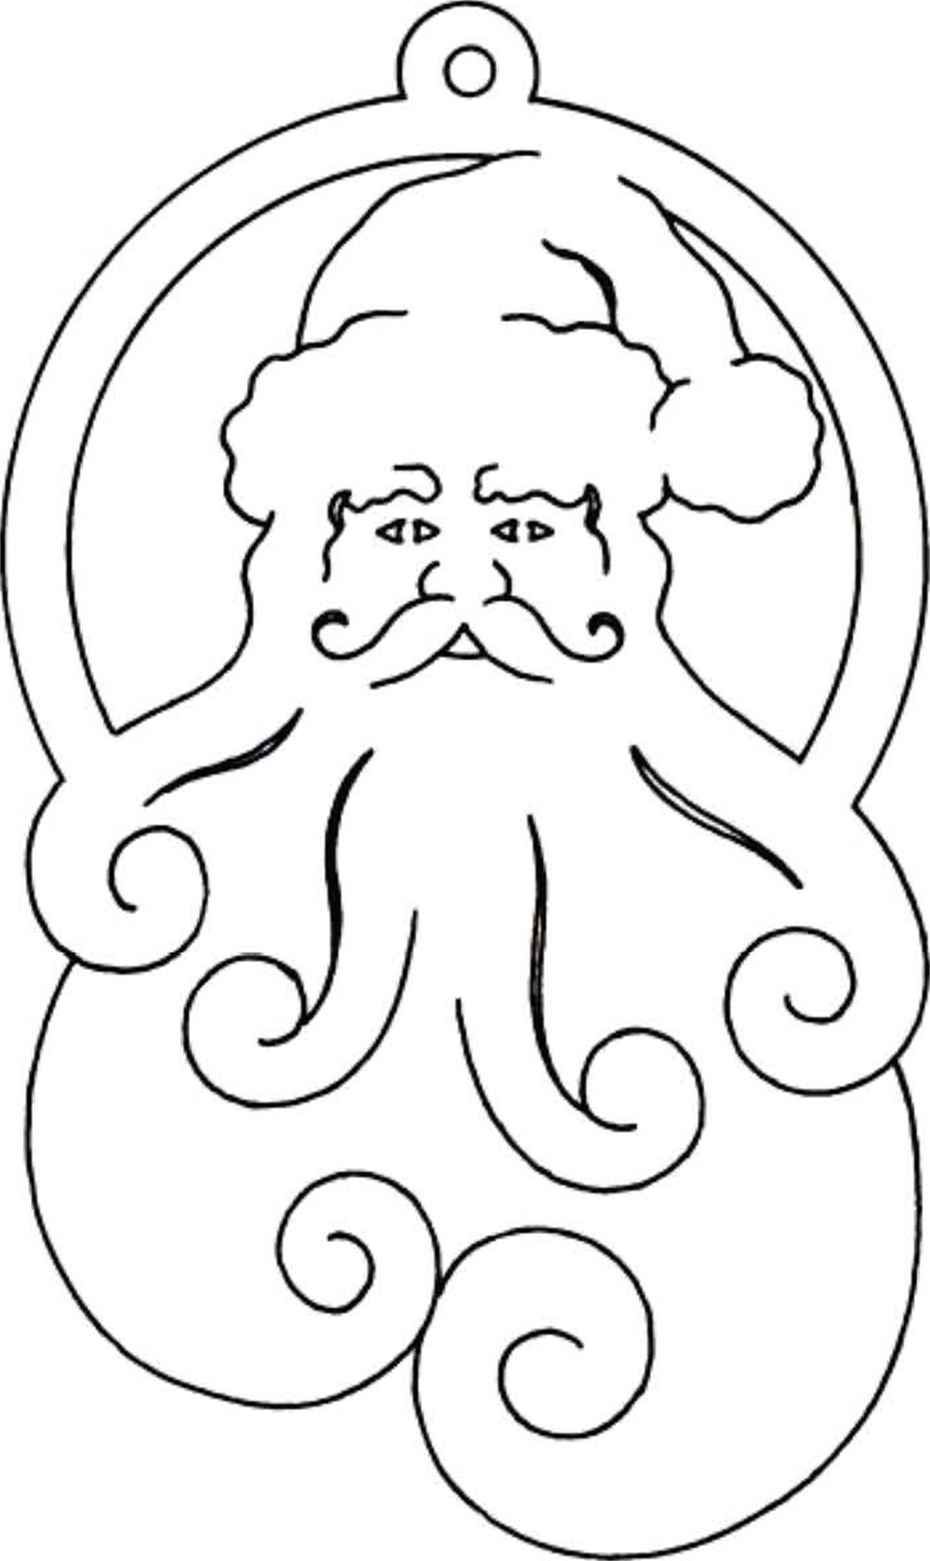 Scroll saw christmas ornament patterns bell ornaments scroll saw